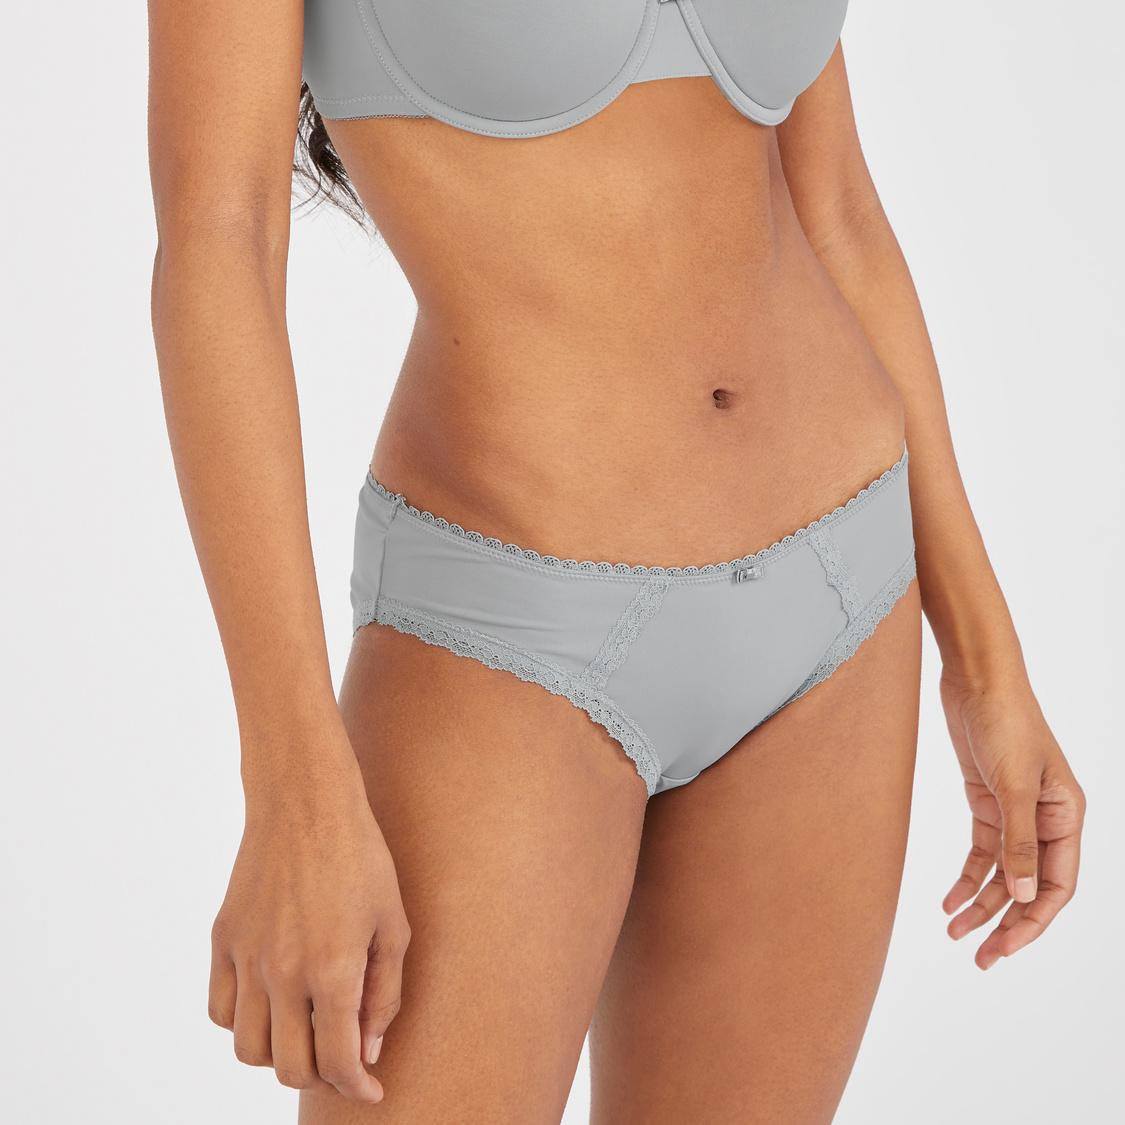 Set of 2 - Assorted Bikini Briefs with Bow Applique